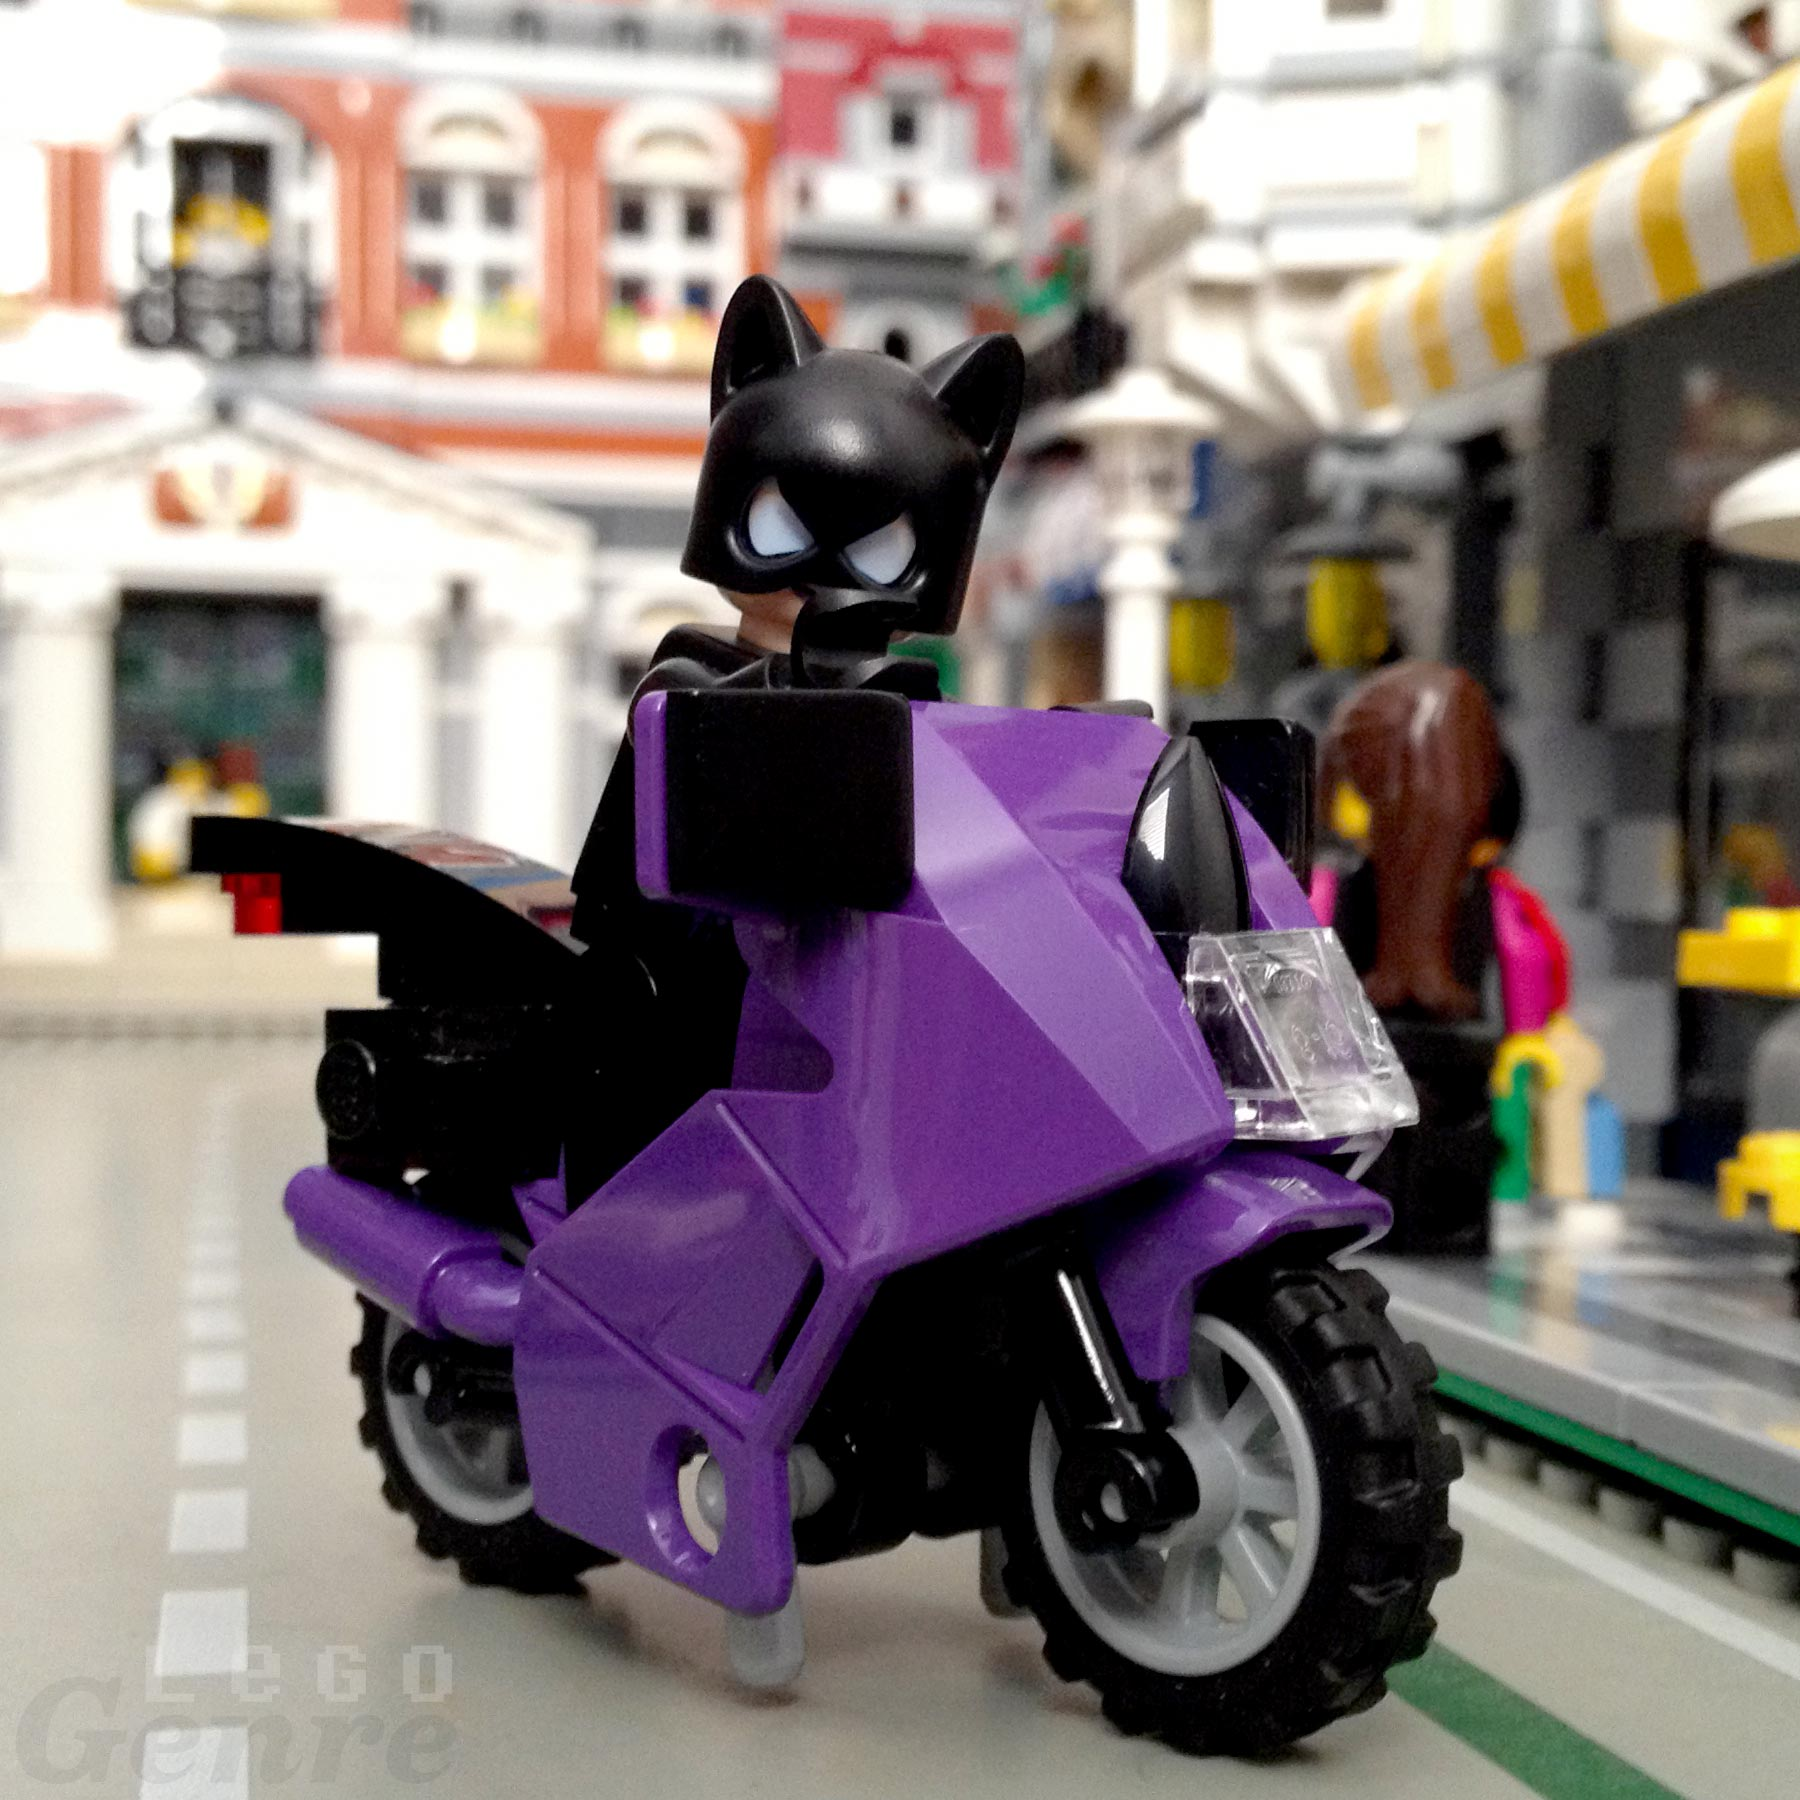 LegoGenre 00326: Catcycle